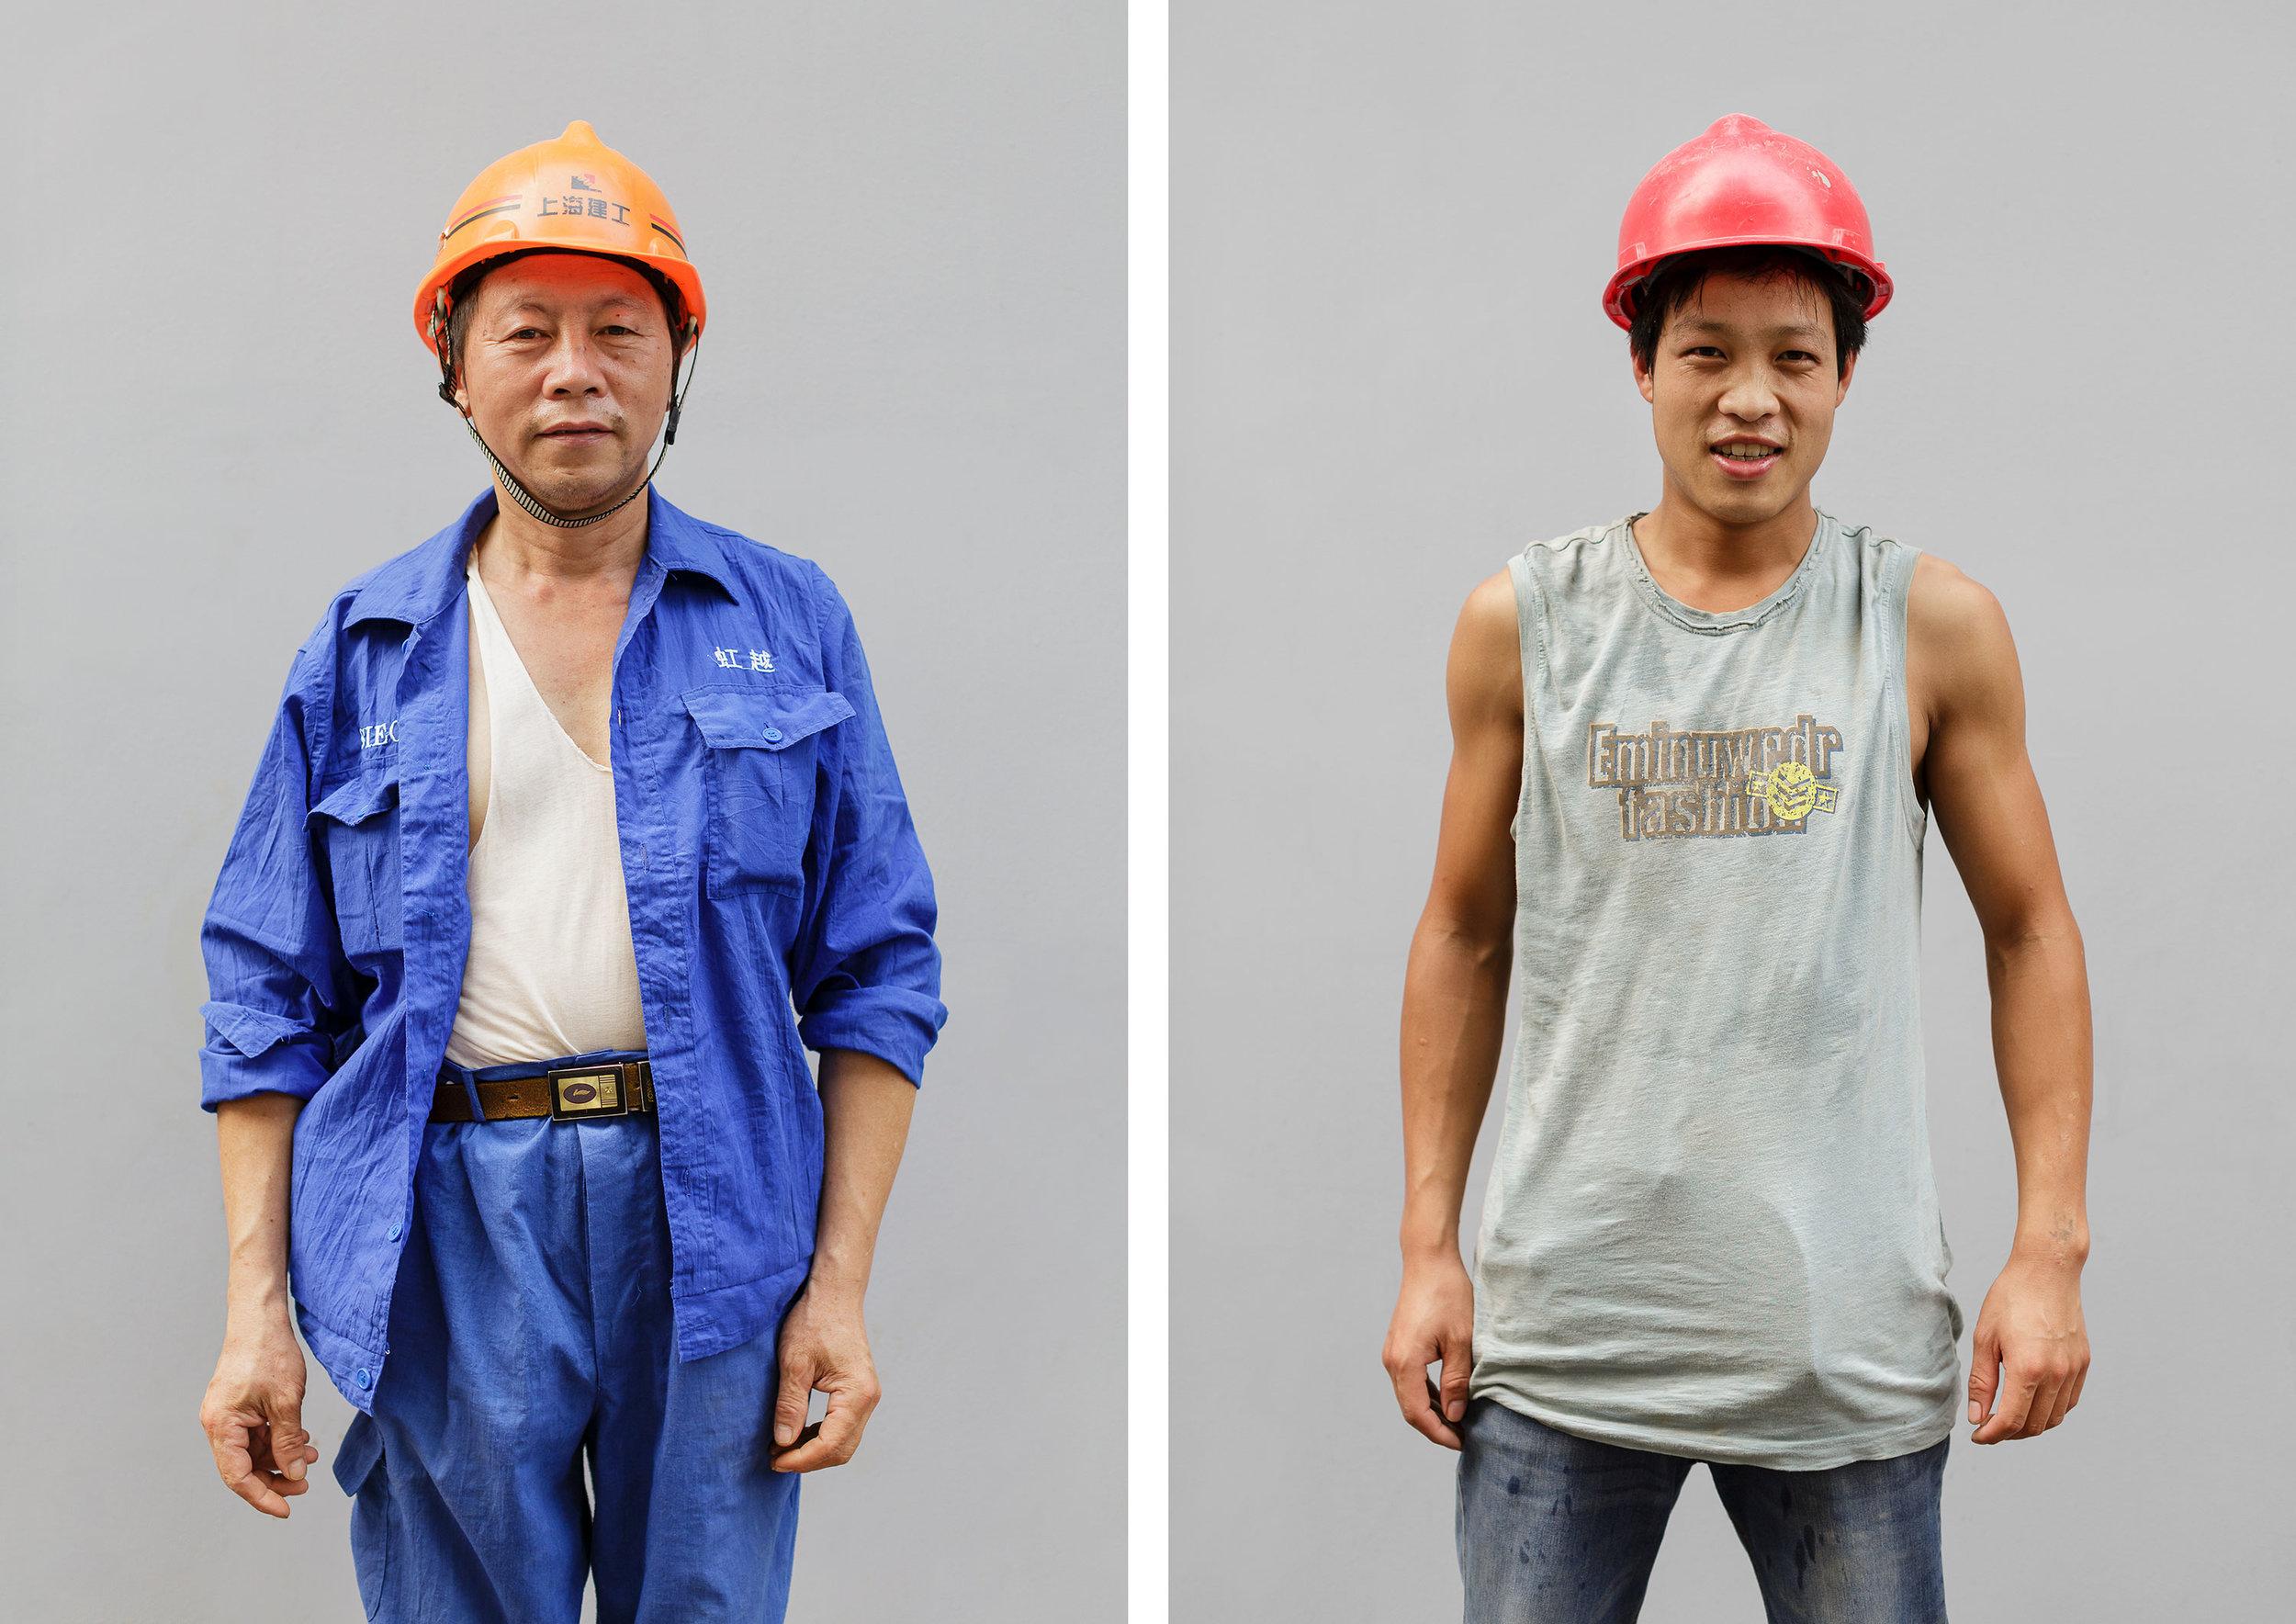 Shanghai_Tower-workers-and-building12.jpg